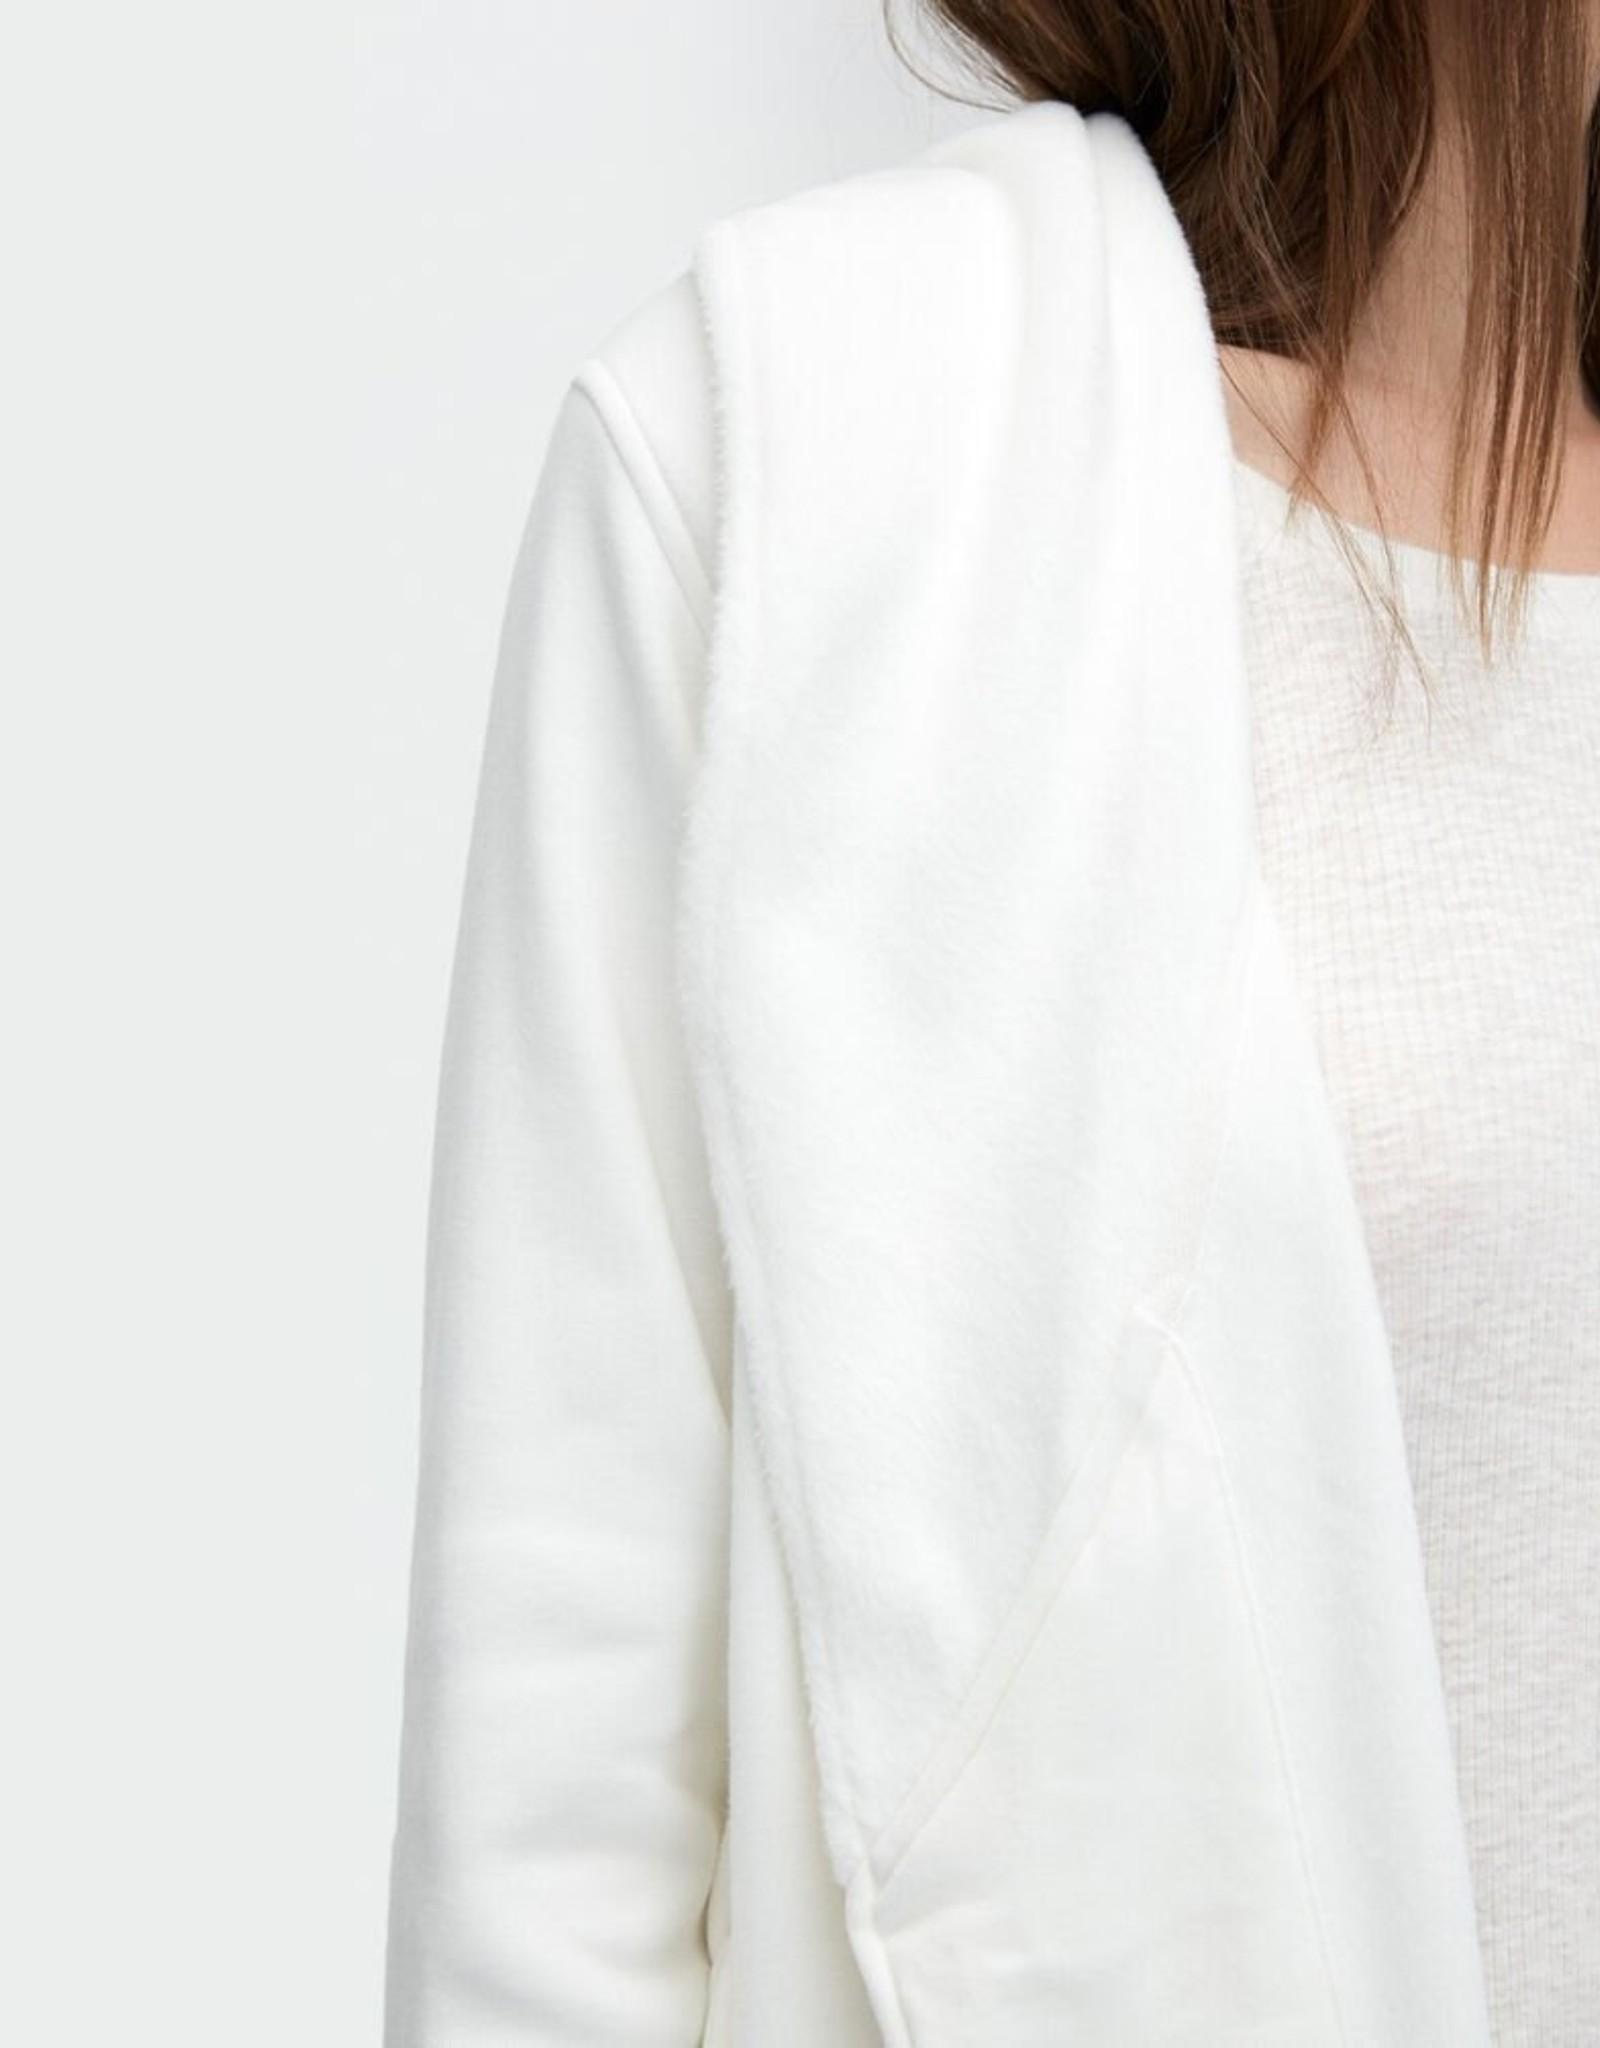 UGG UGG - Woman's Blanche Cream Lightweight Robe